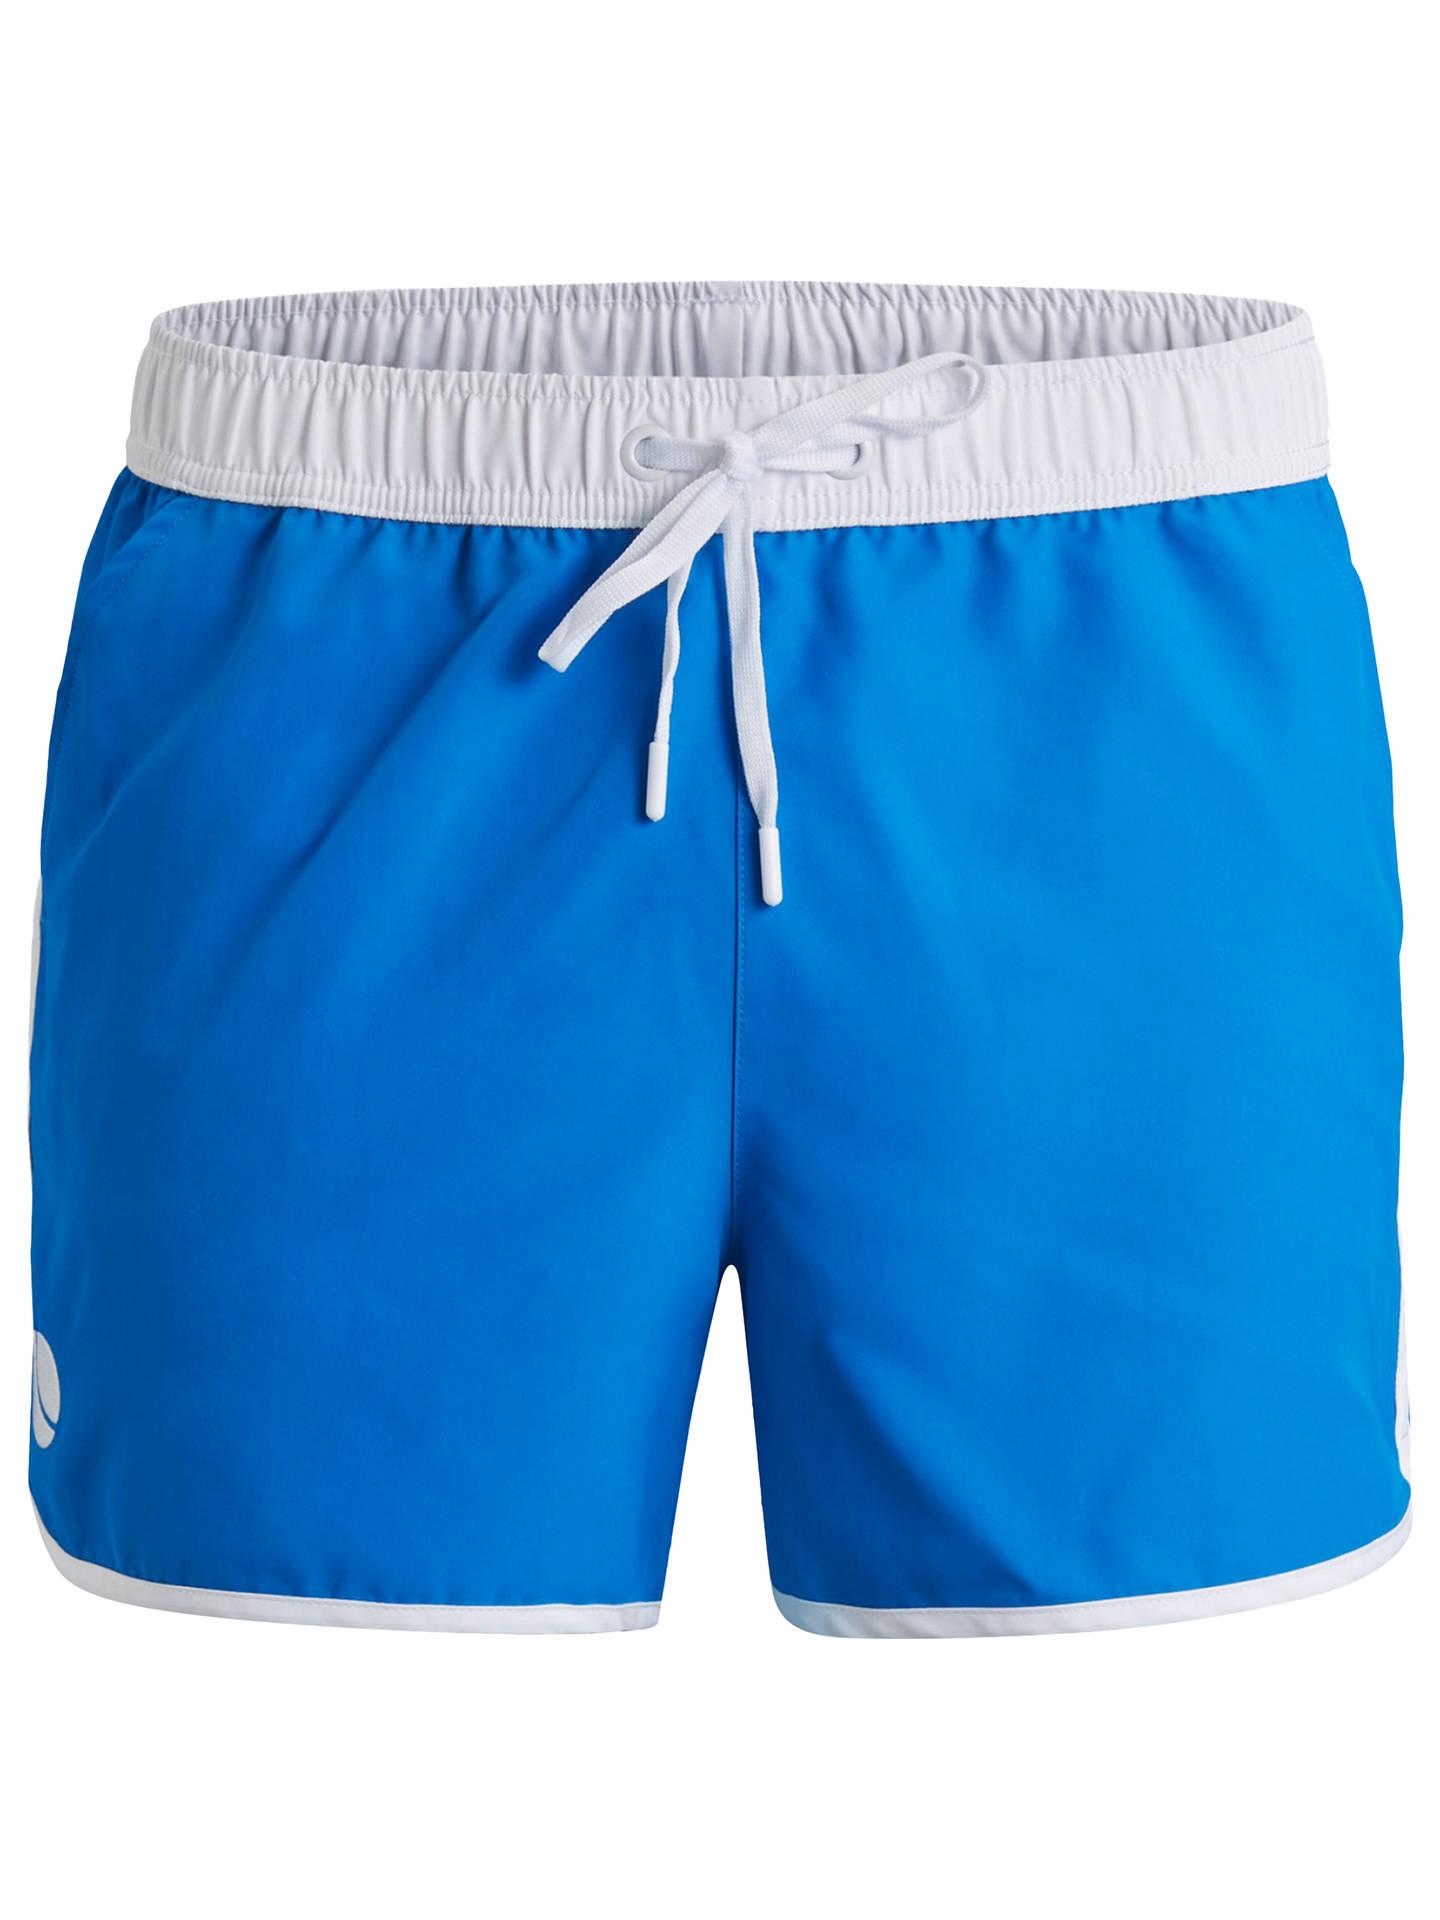 42968c3917 Buy Bjorn Borg Sandro Swim Shorts, Blue, S Online at johnlewis.com ...